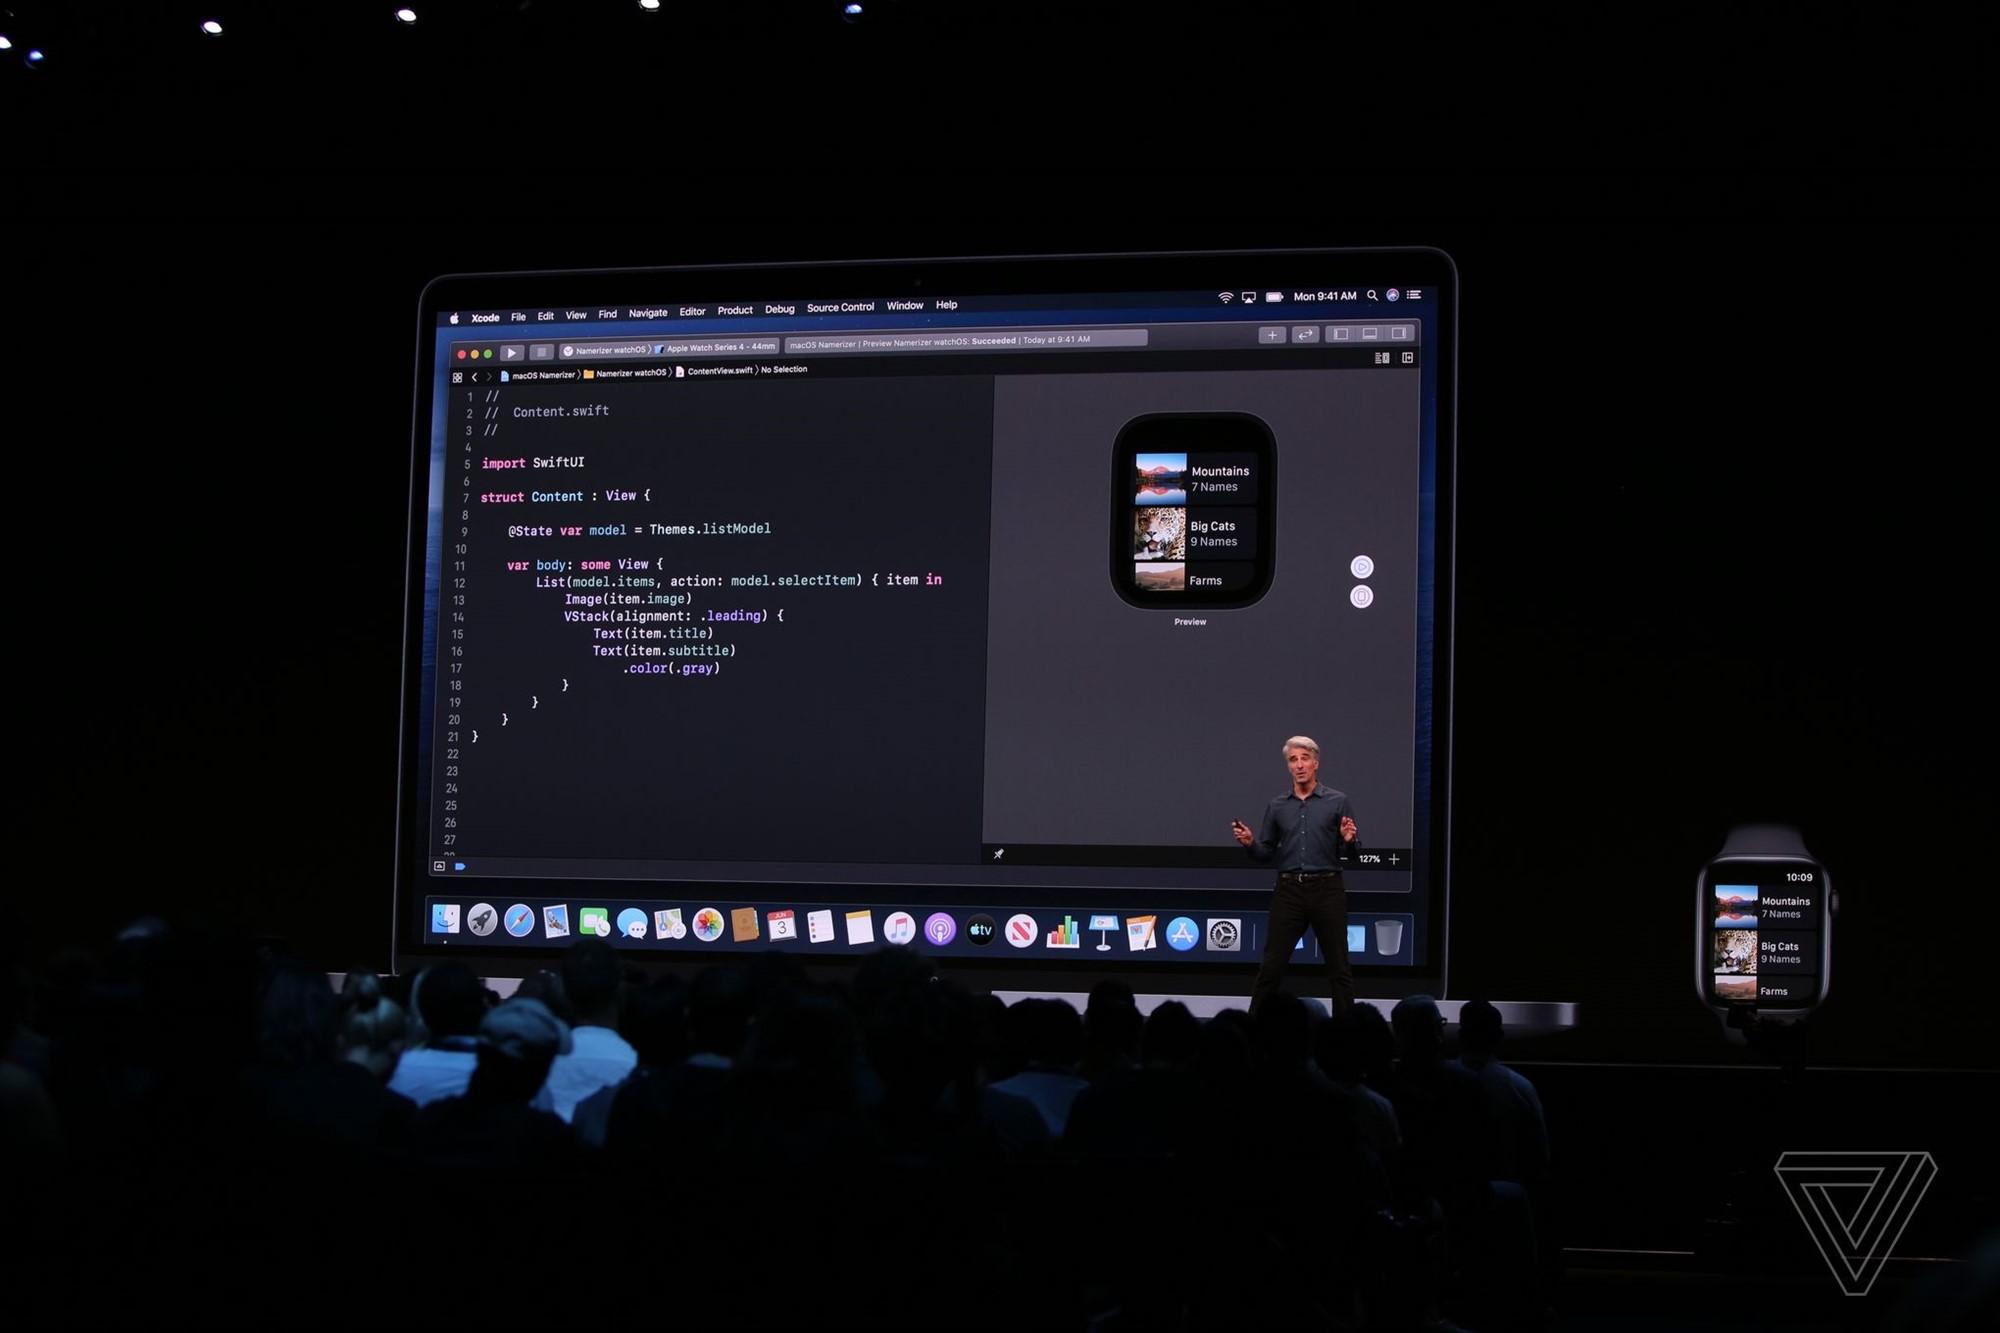 Keynote Apple Du 3 Juin 2019 En Live Sur Iphoneaddict Fr